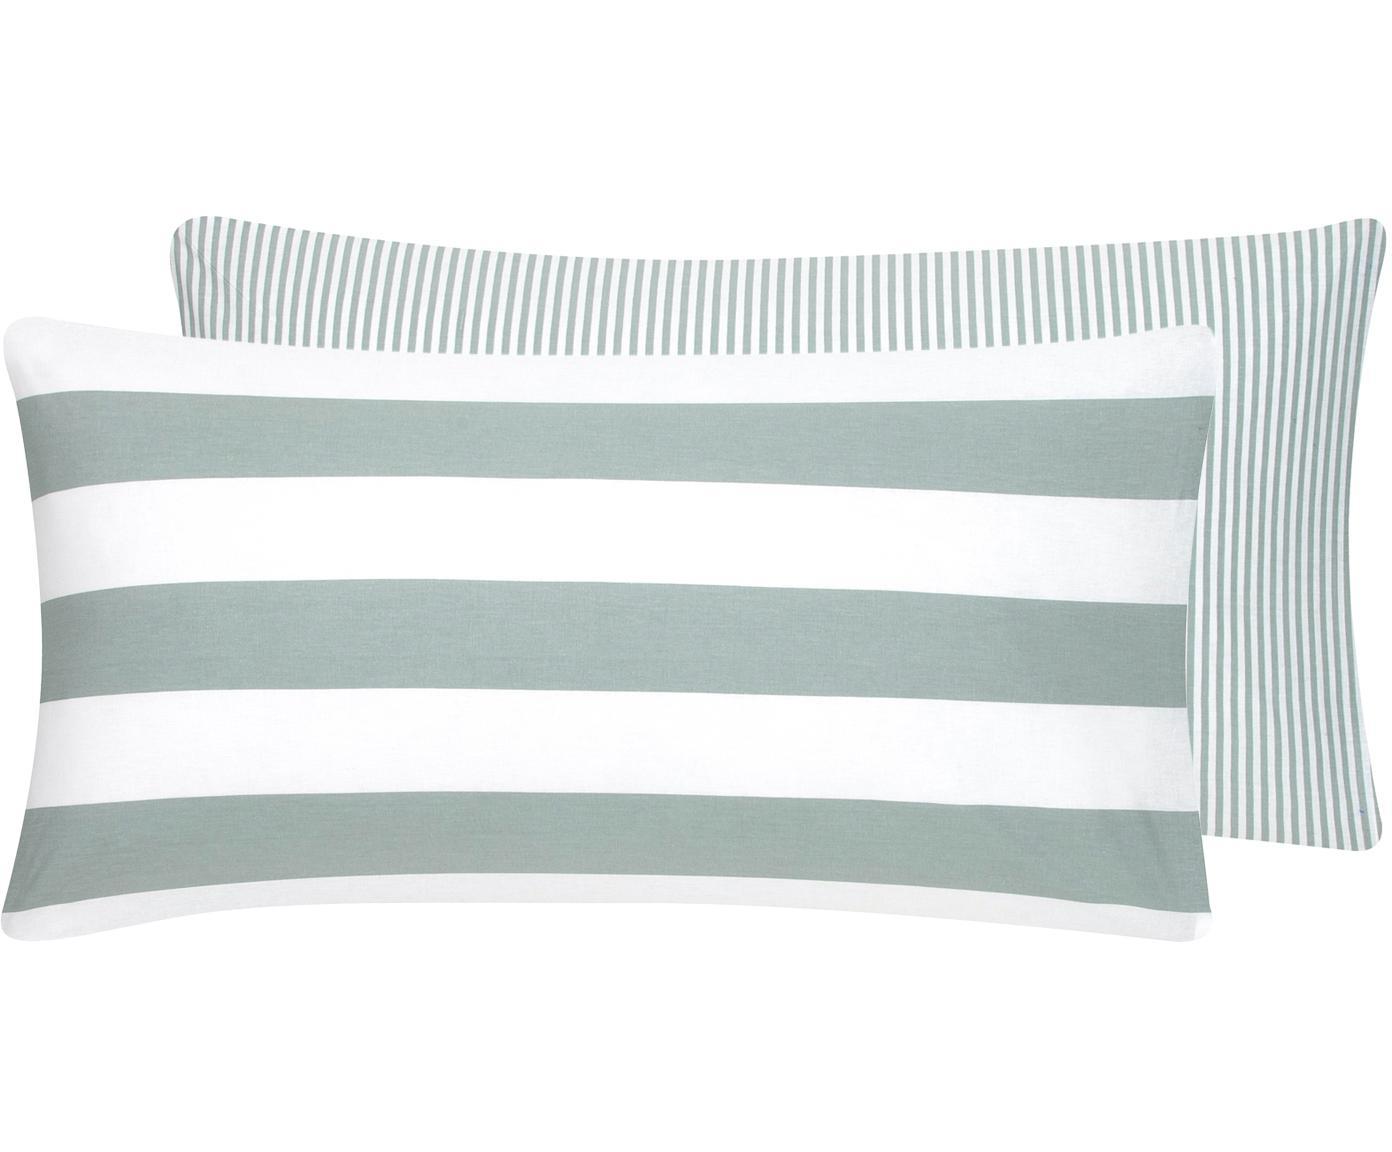 Funda de almohada de tejido renforcé Lorena, caras distintas, Verde salvia, blanco, An 45 x L 85 cm